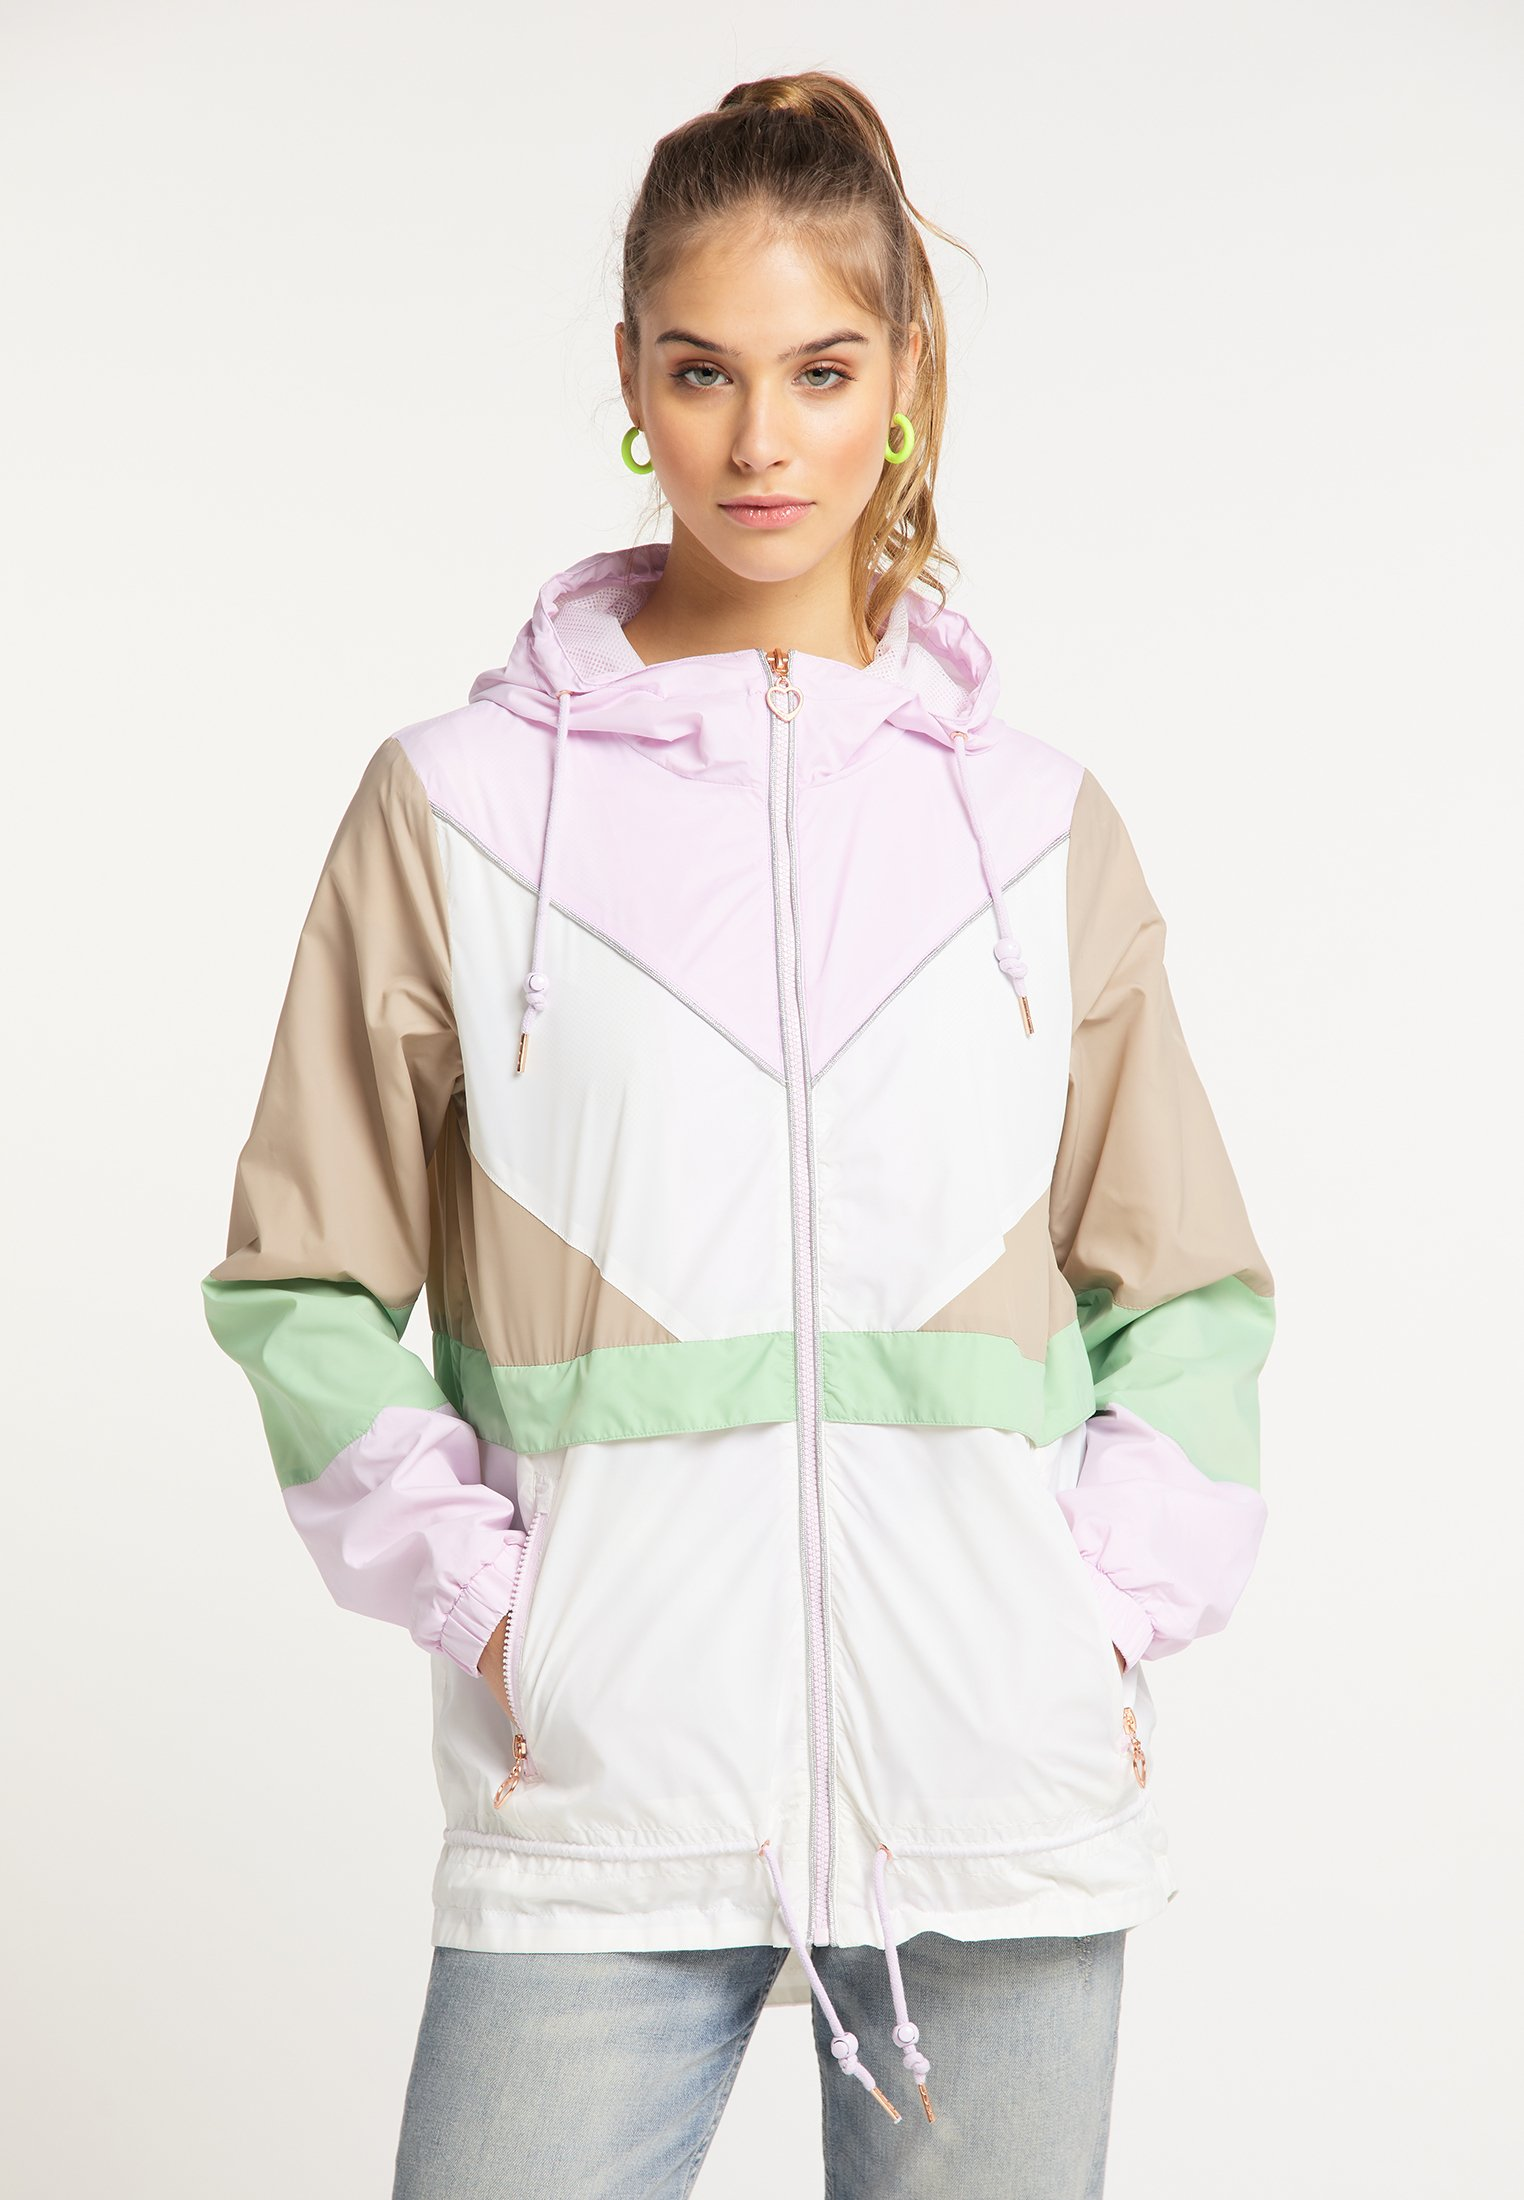 Hyper Online Women's Clothing myMo Summer jacket light pink bOBFwhxSQ